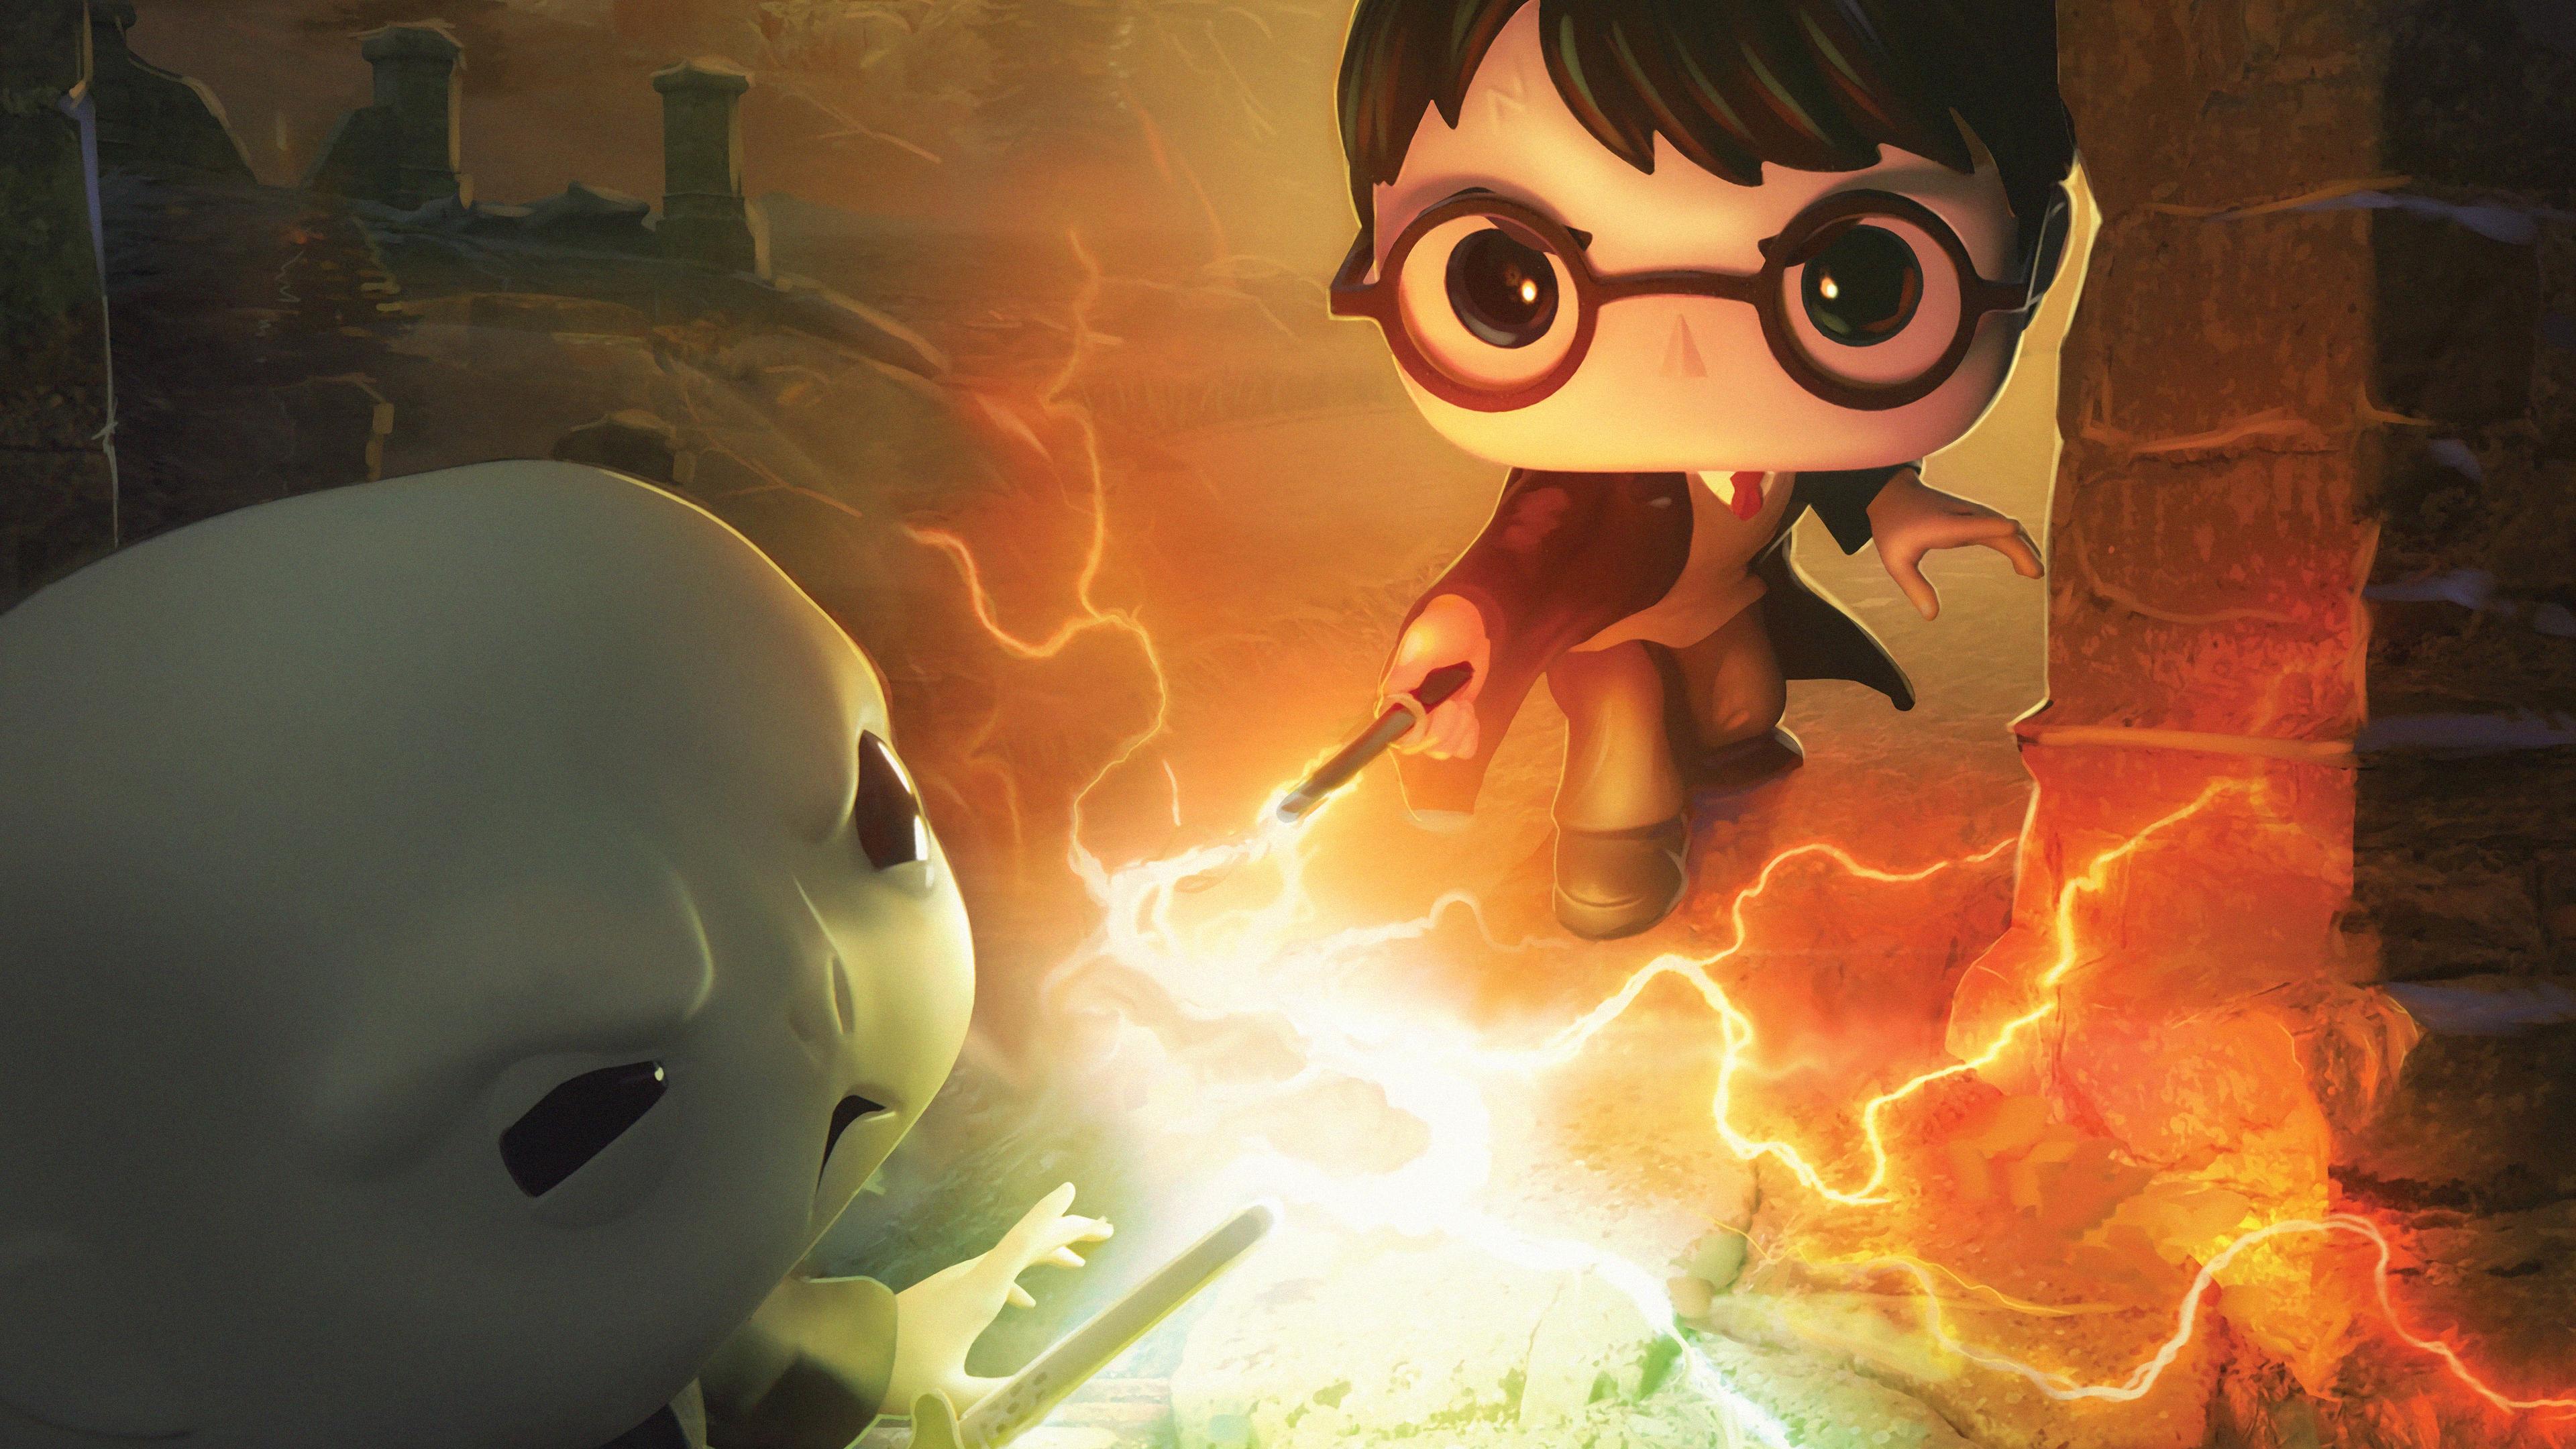 Harry Potter Dc Funkoverse 4k Hd Games 4k Wallpapers